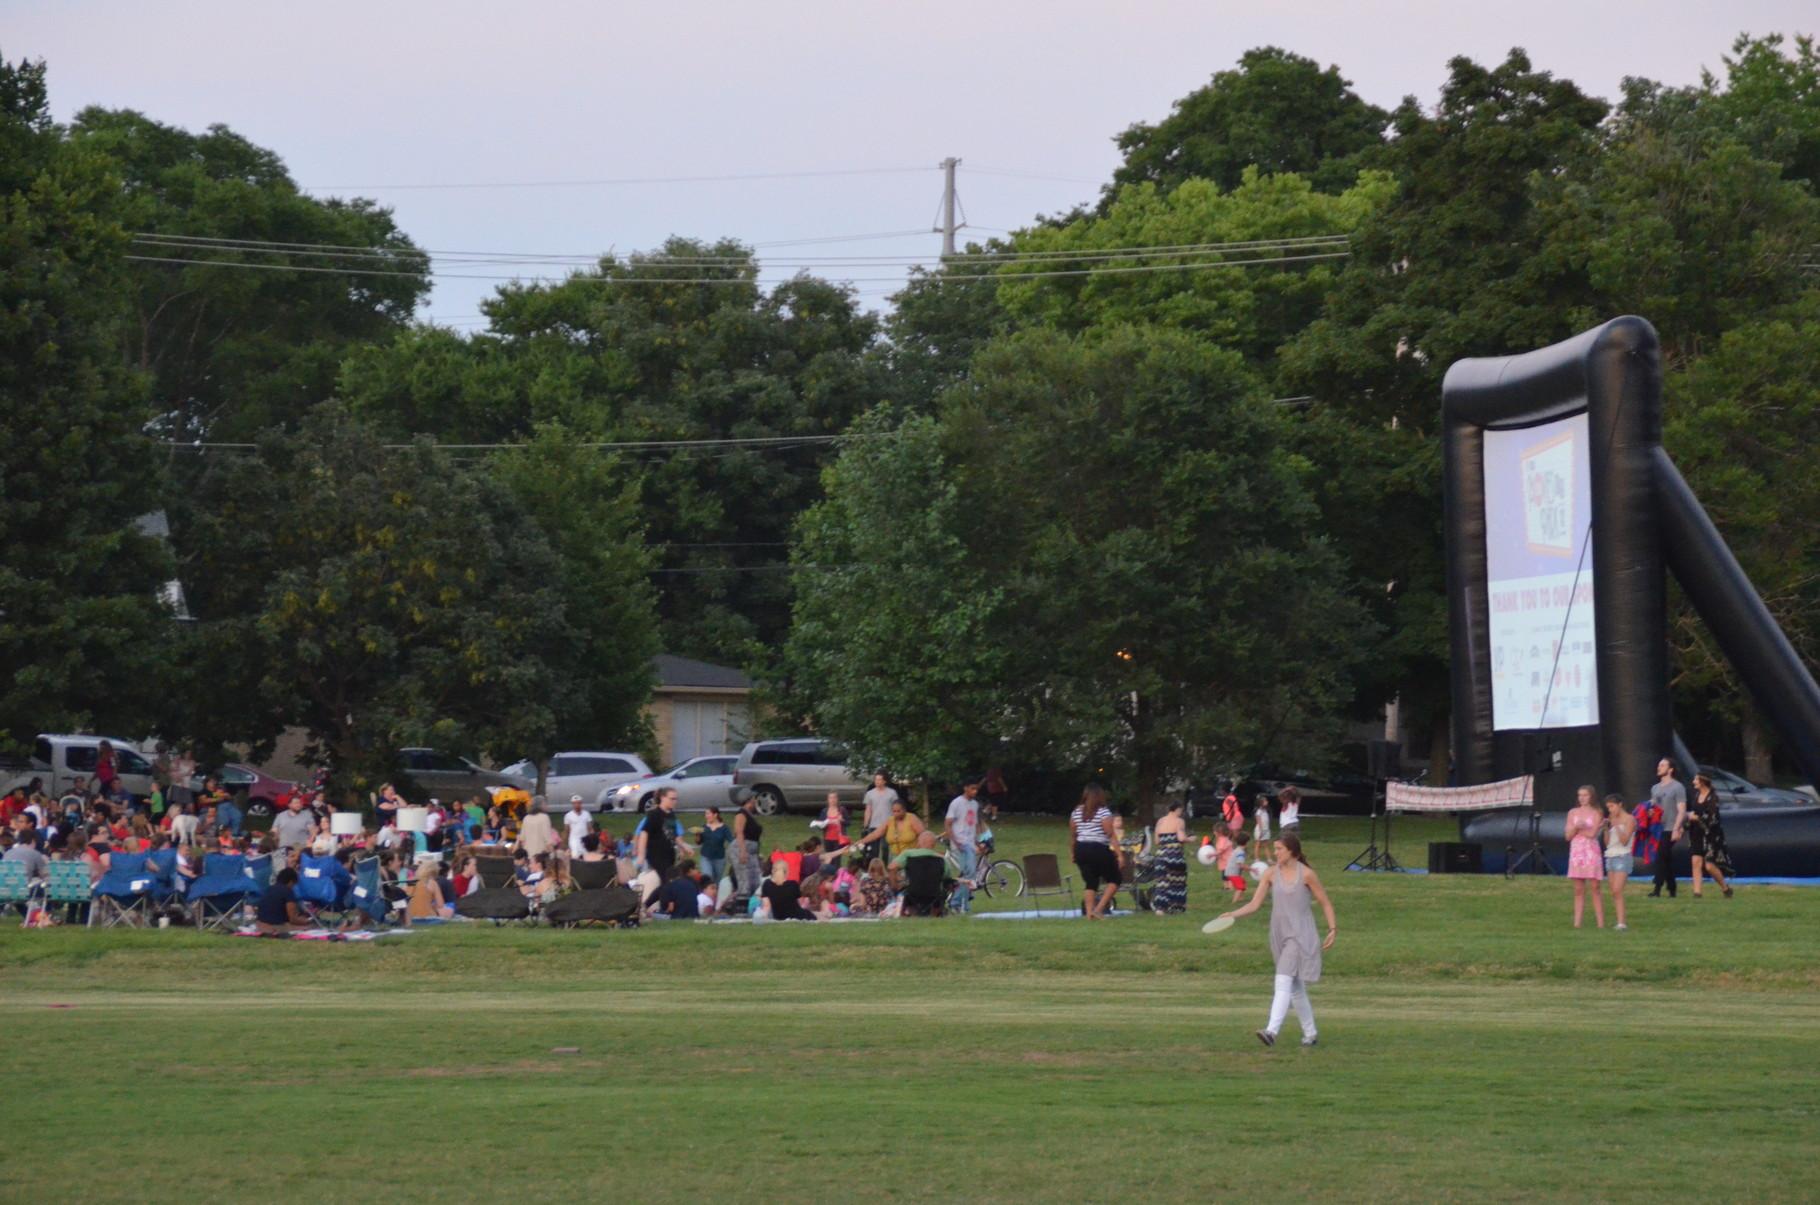 Outdoor Kino im Park, Big Hero 6!